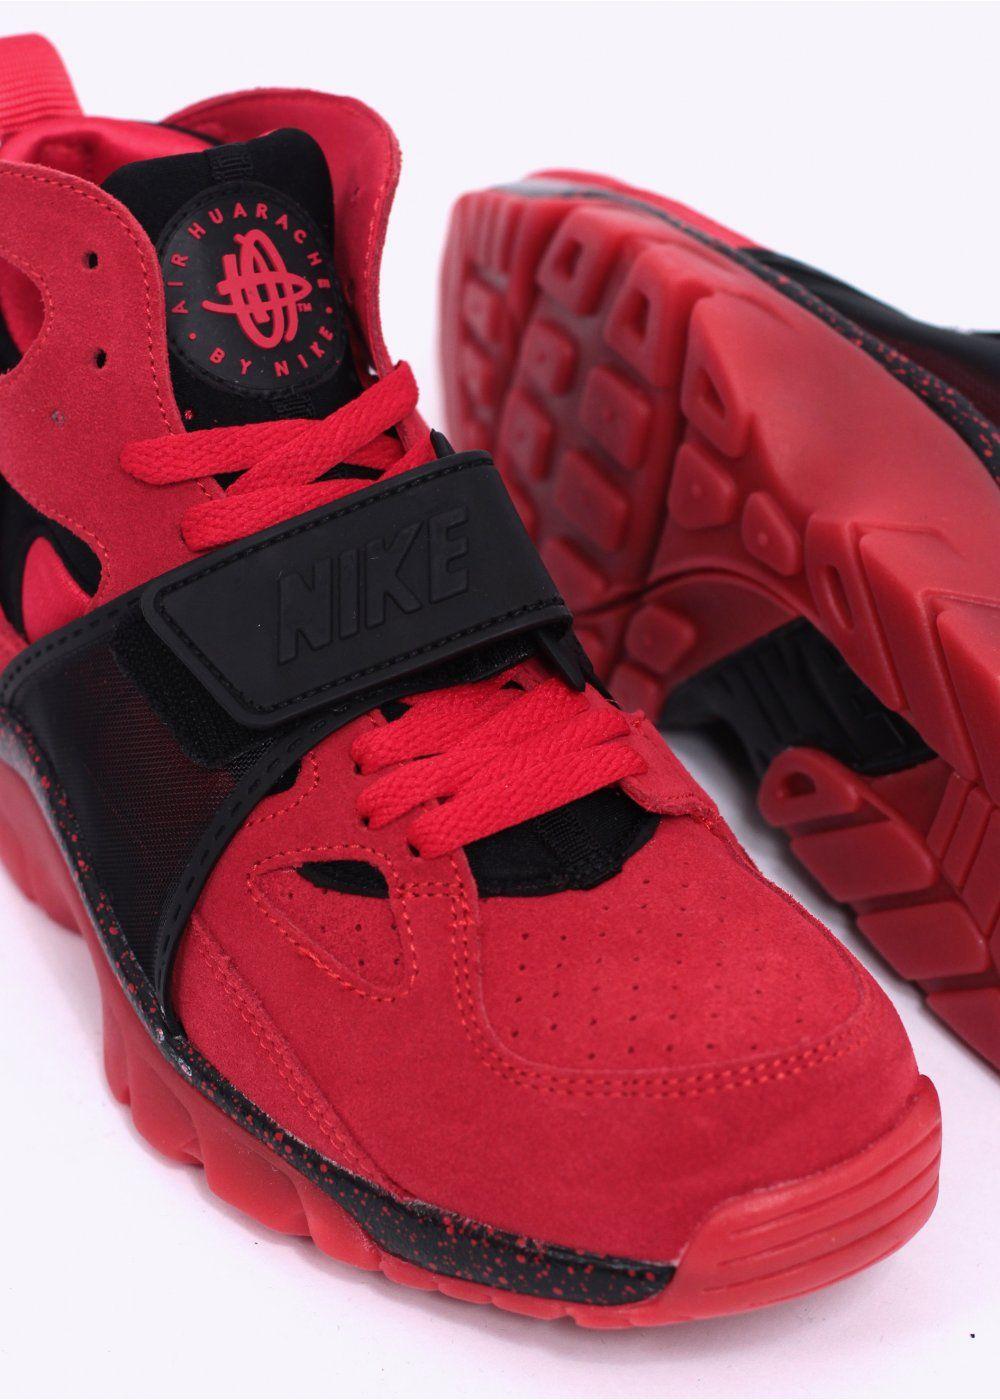 4c6bf2b33fef Nike Quickstrike Air Trainer Huarache  Love Hate   Love  PRM QS Trainers - Challenge  Red   Black